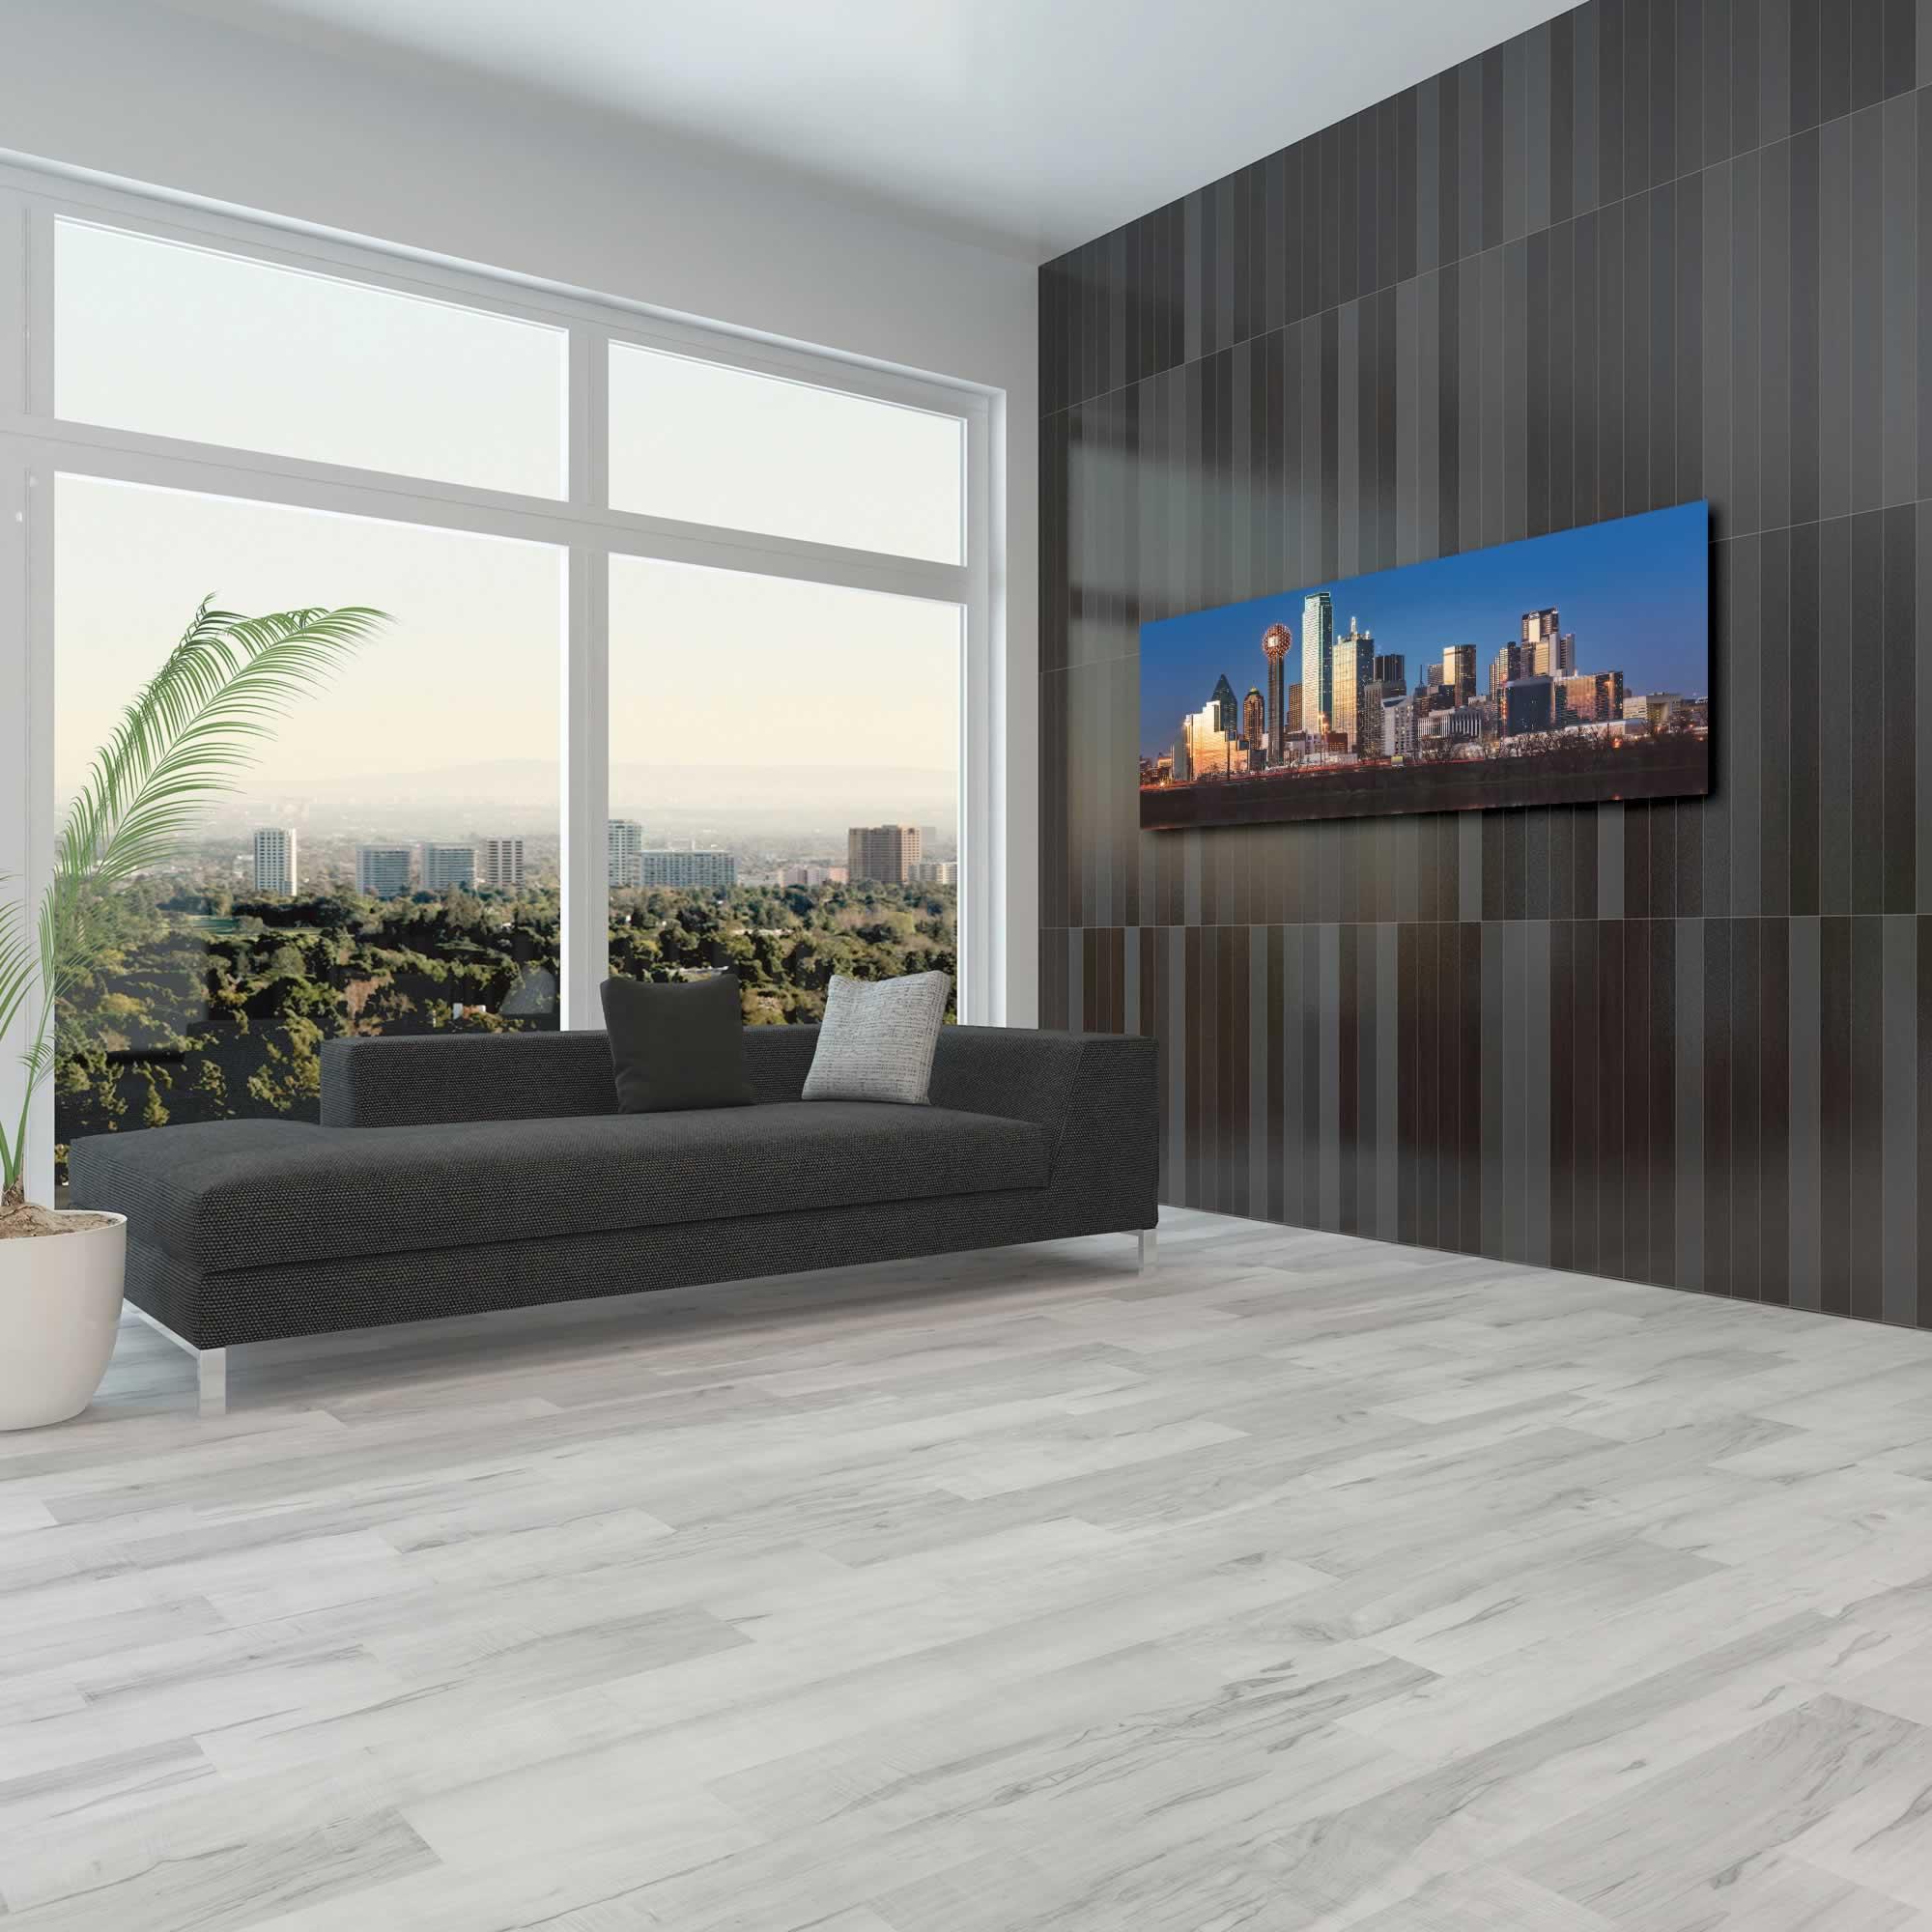 Dallas City Skyline - Urban Modern Art, Designer Home Decor, Cityscape Wall Artwork, Trendy Contemporary Art - Alternate View 3